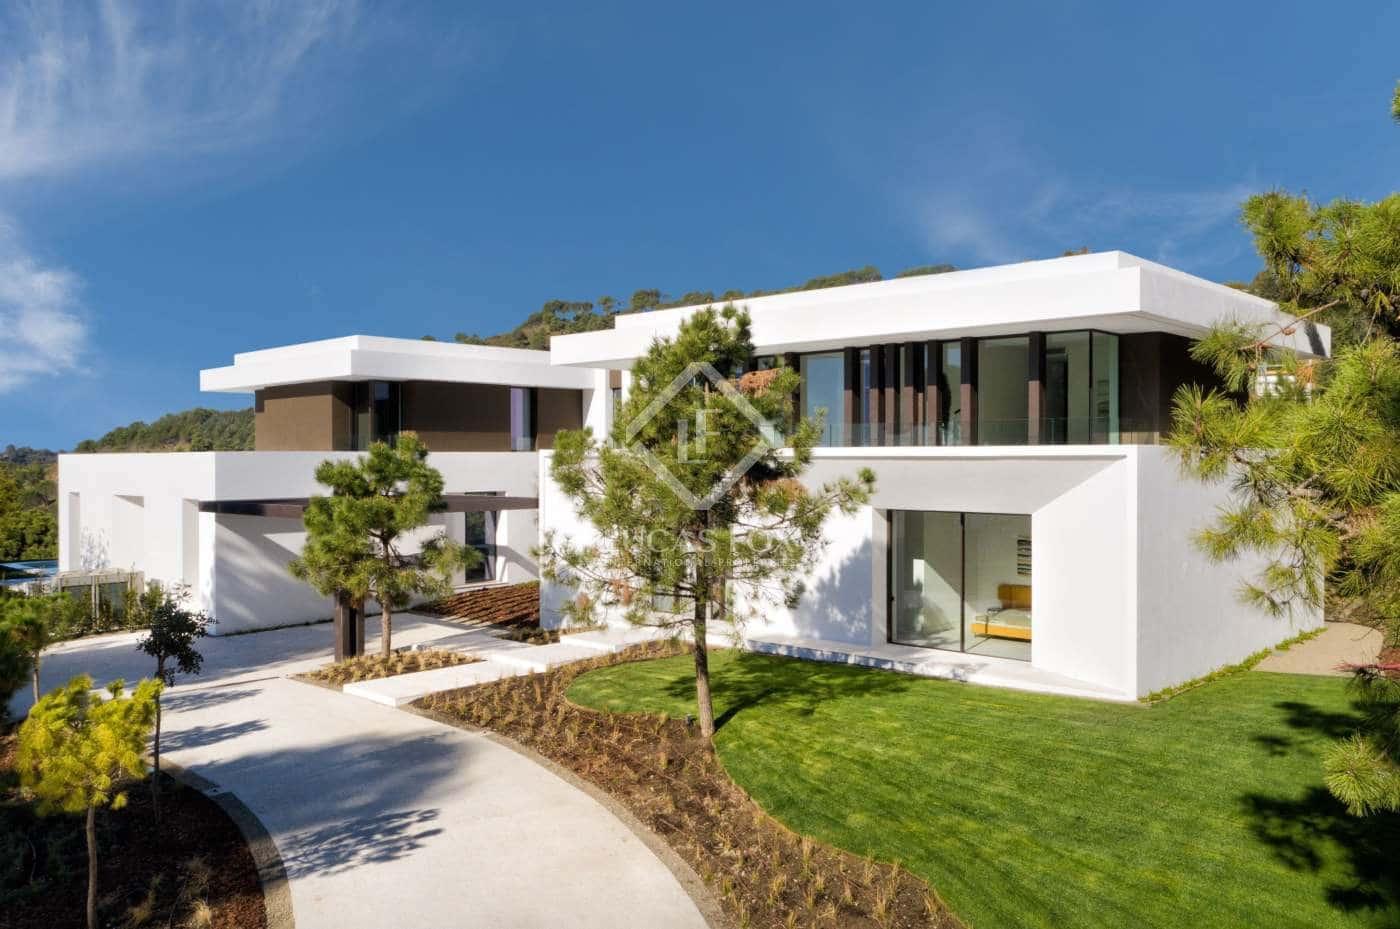 7 bedroom Villa for sale in Marbella with pool garage - € 4,500,000 (Ref: 4776965)